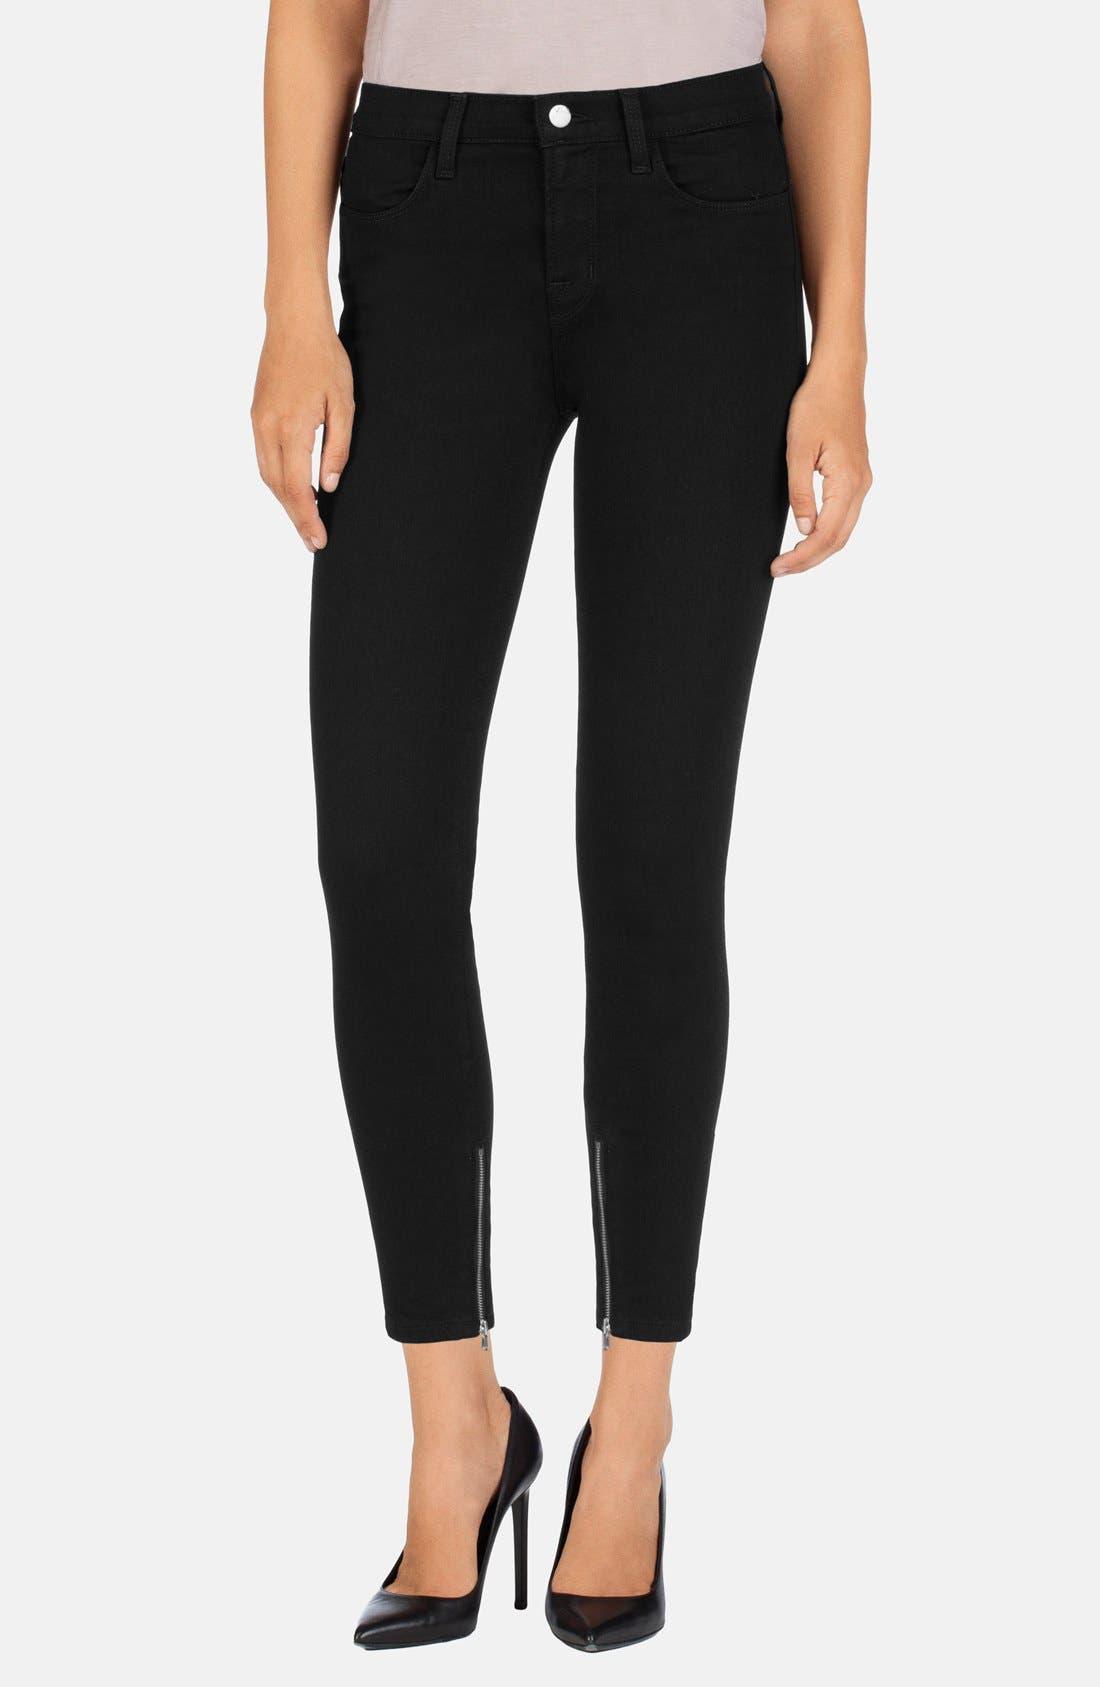 Alternate Image 1 Selected - J Brand 'Hanna' High Rise Crop Jeans (Vanity)